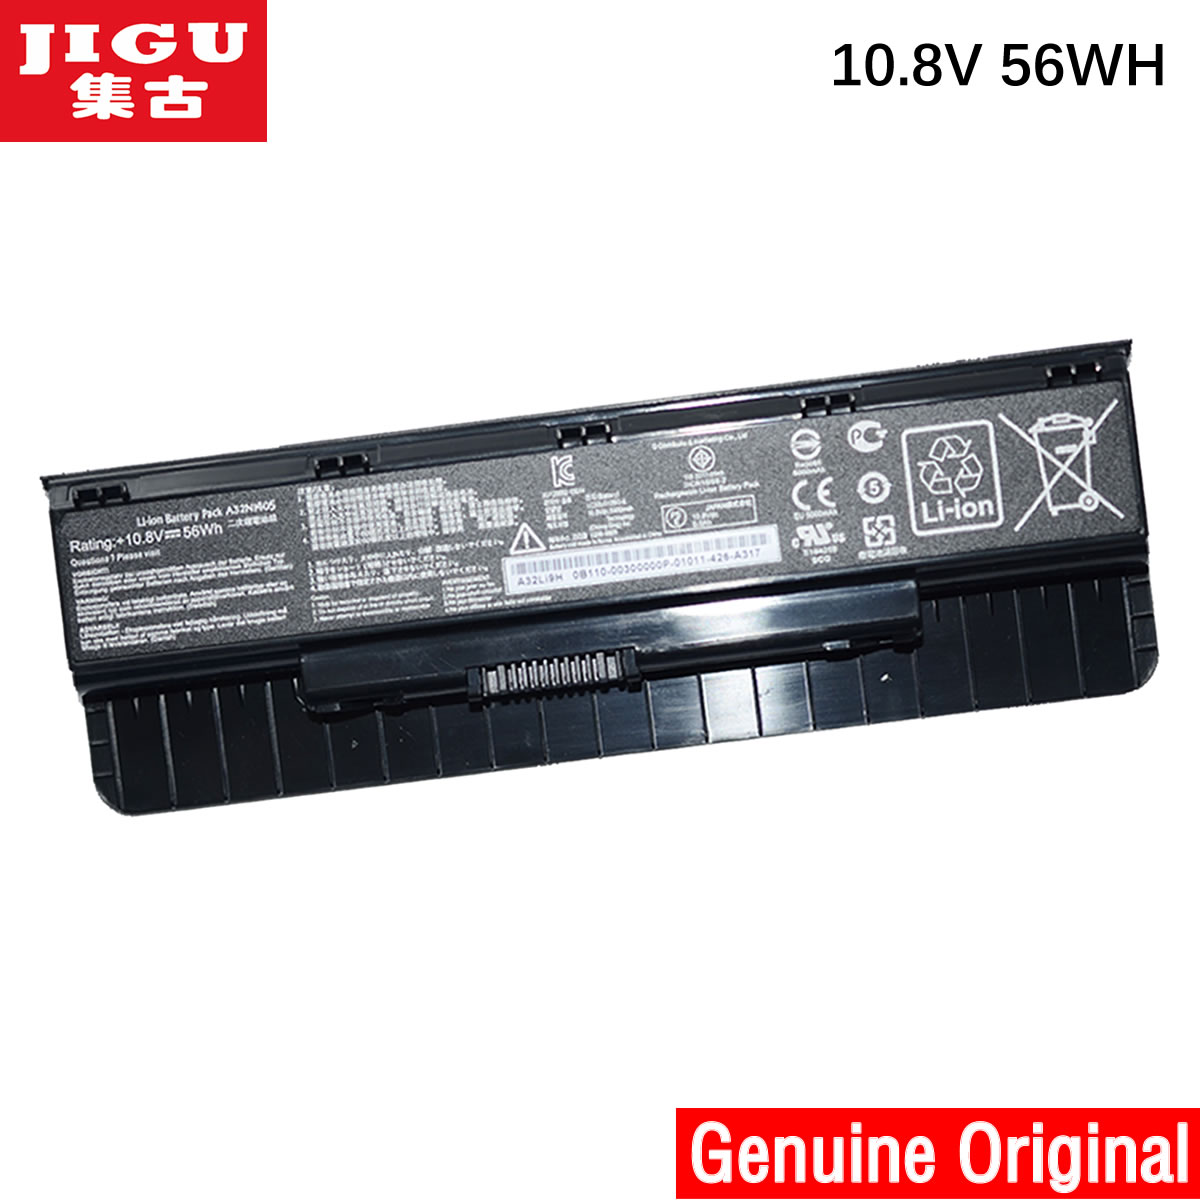 JIGU Original Laptop Battery For Asus N551JN N551JQ N551JV N551JW N551JX N551Z N551ZU N751 N751J N751JK N751JM N751JQ